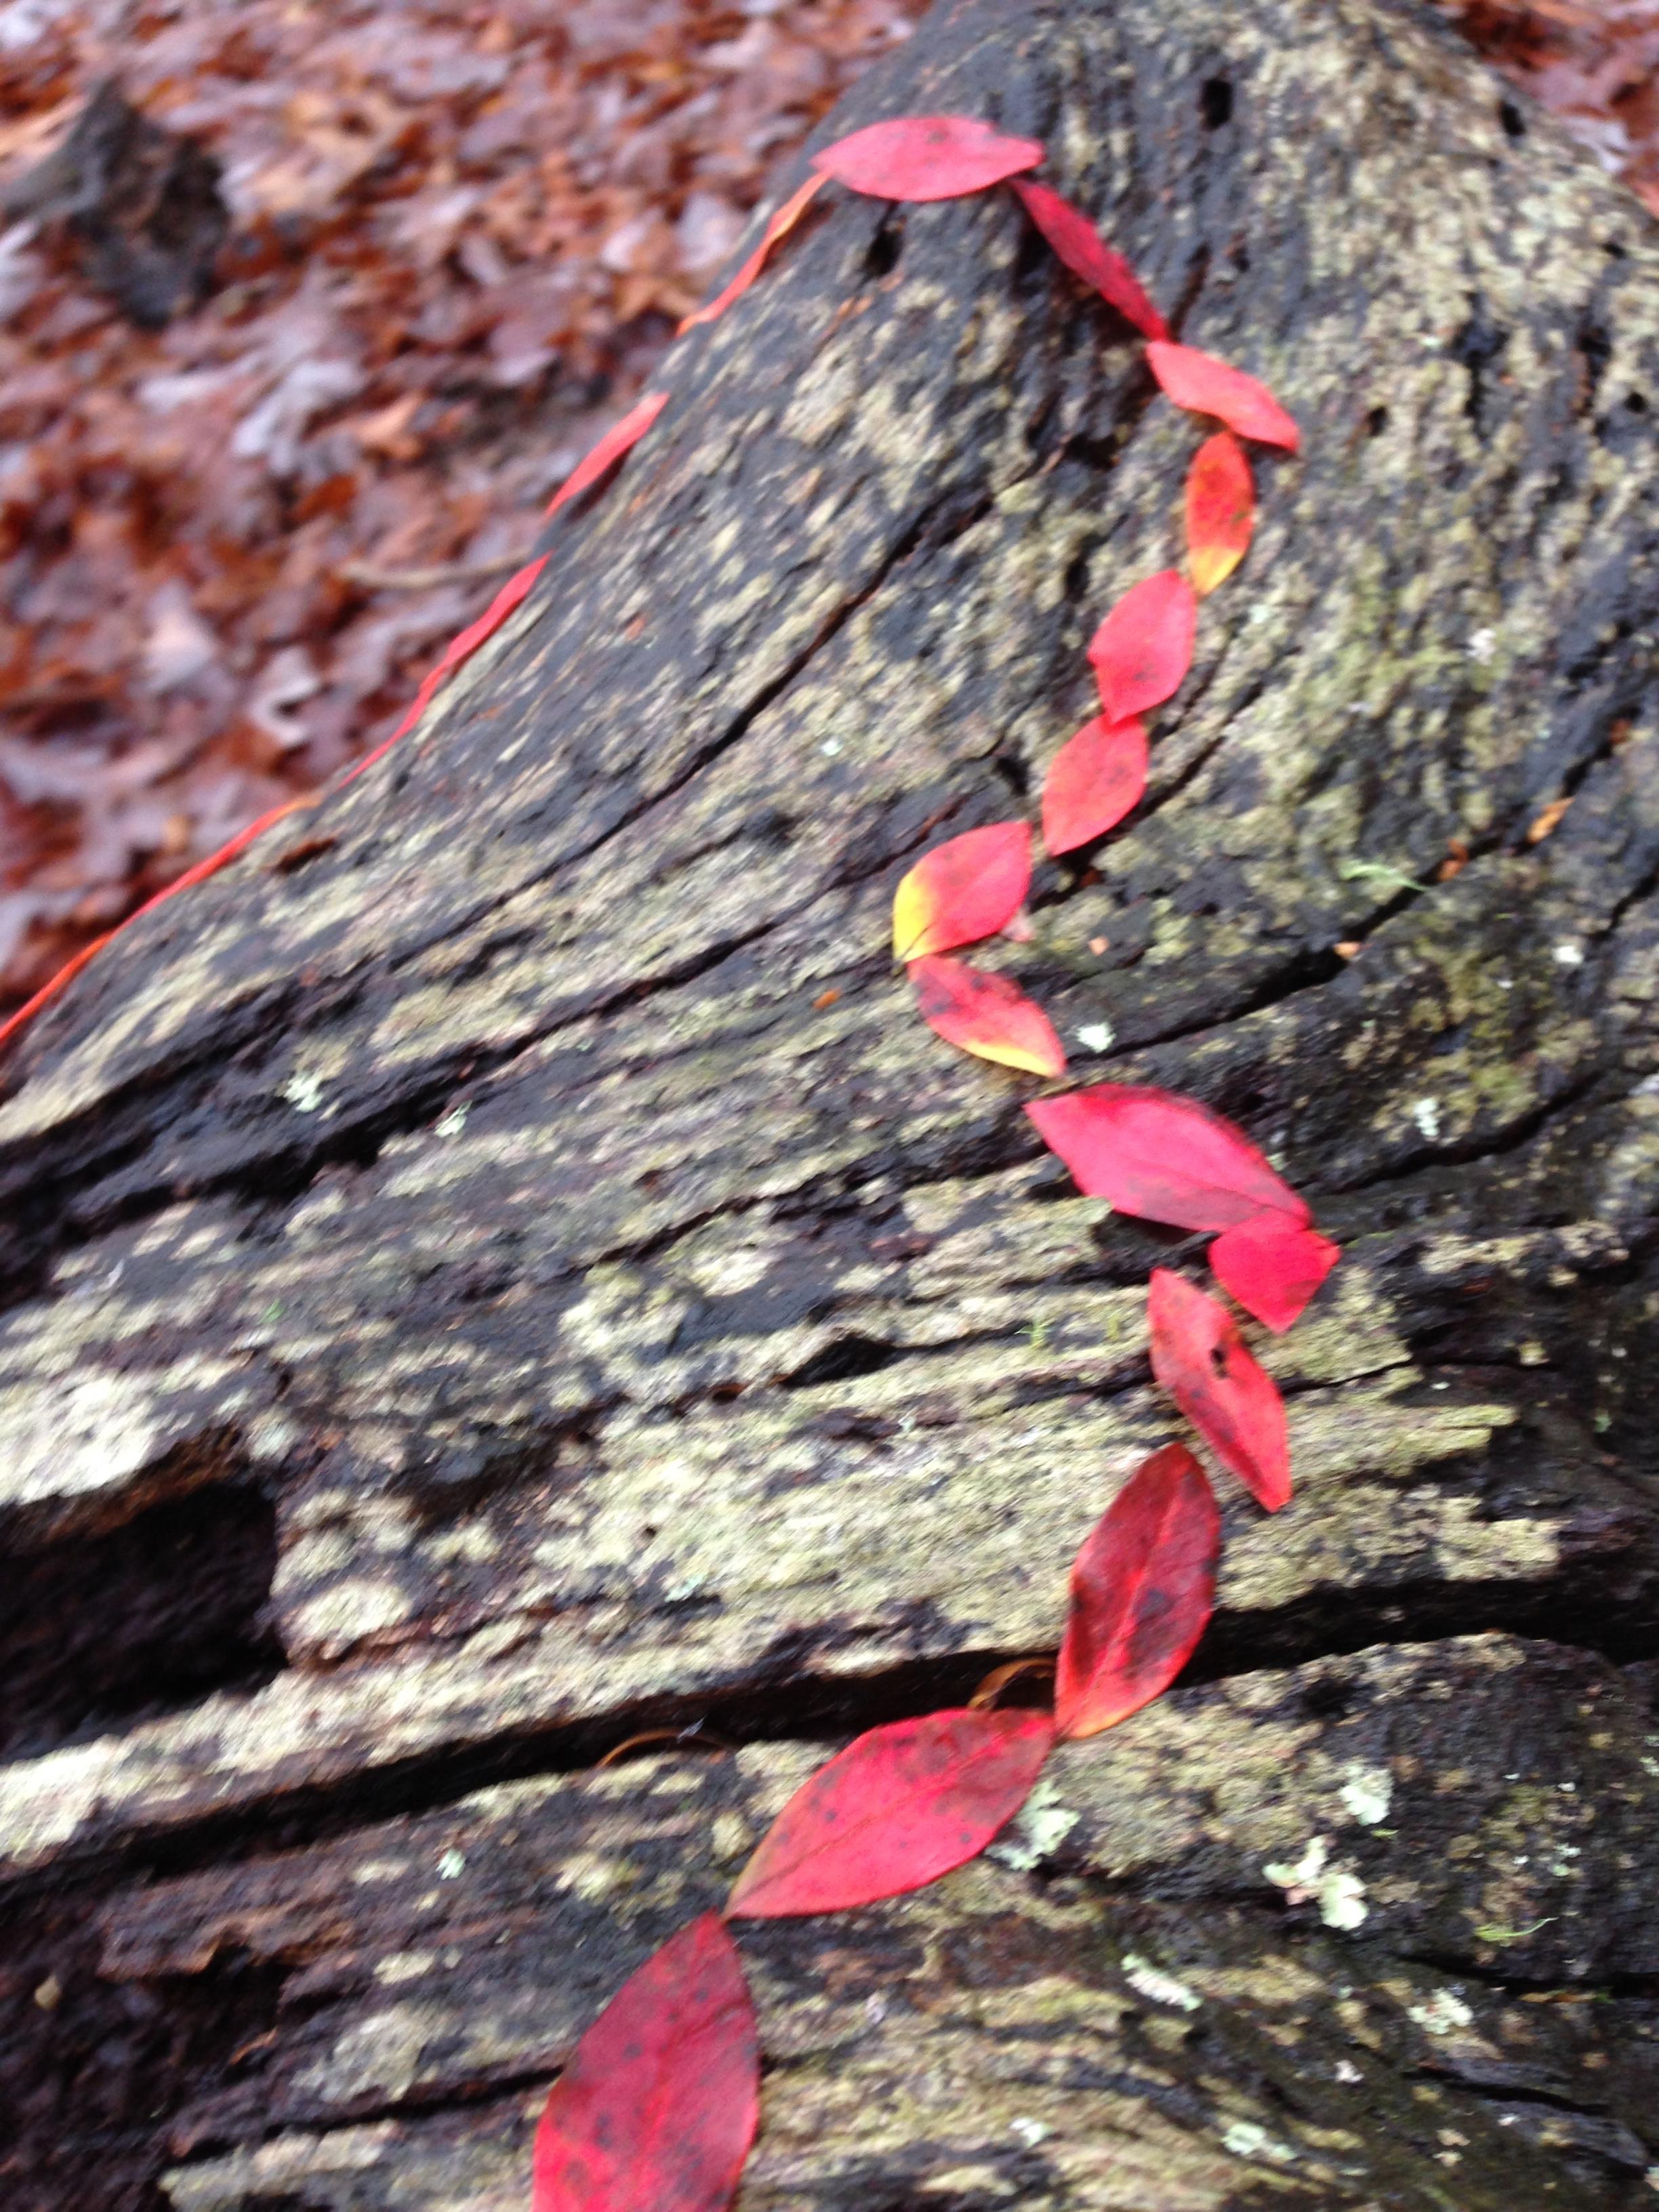 Leaves on Stump. Lake Herrick/Oconee Forest Trail. The University of Georgia. Athens, GA. Fall 2013.